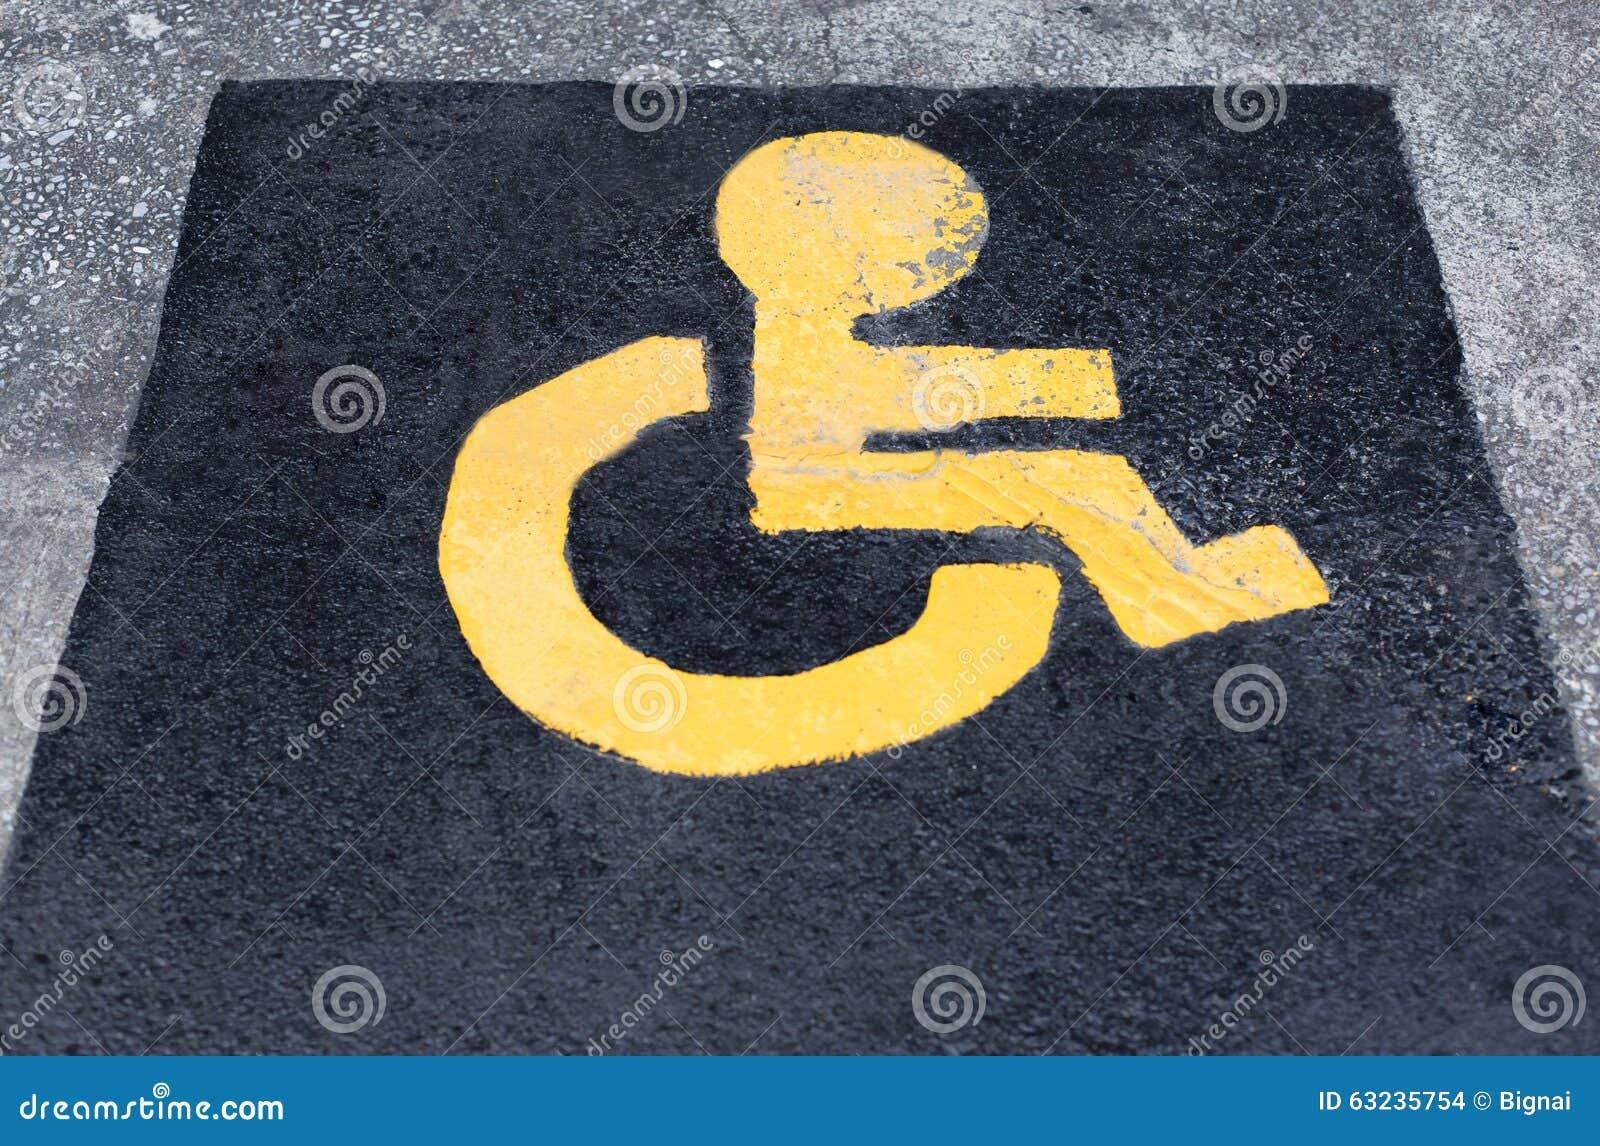 Symbol of child wheel chair in parking lot stock photo image of symbol of child wheel chair in parking lot buycottarizona